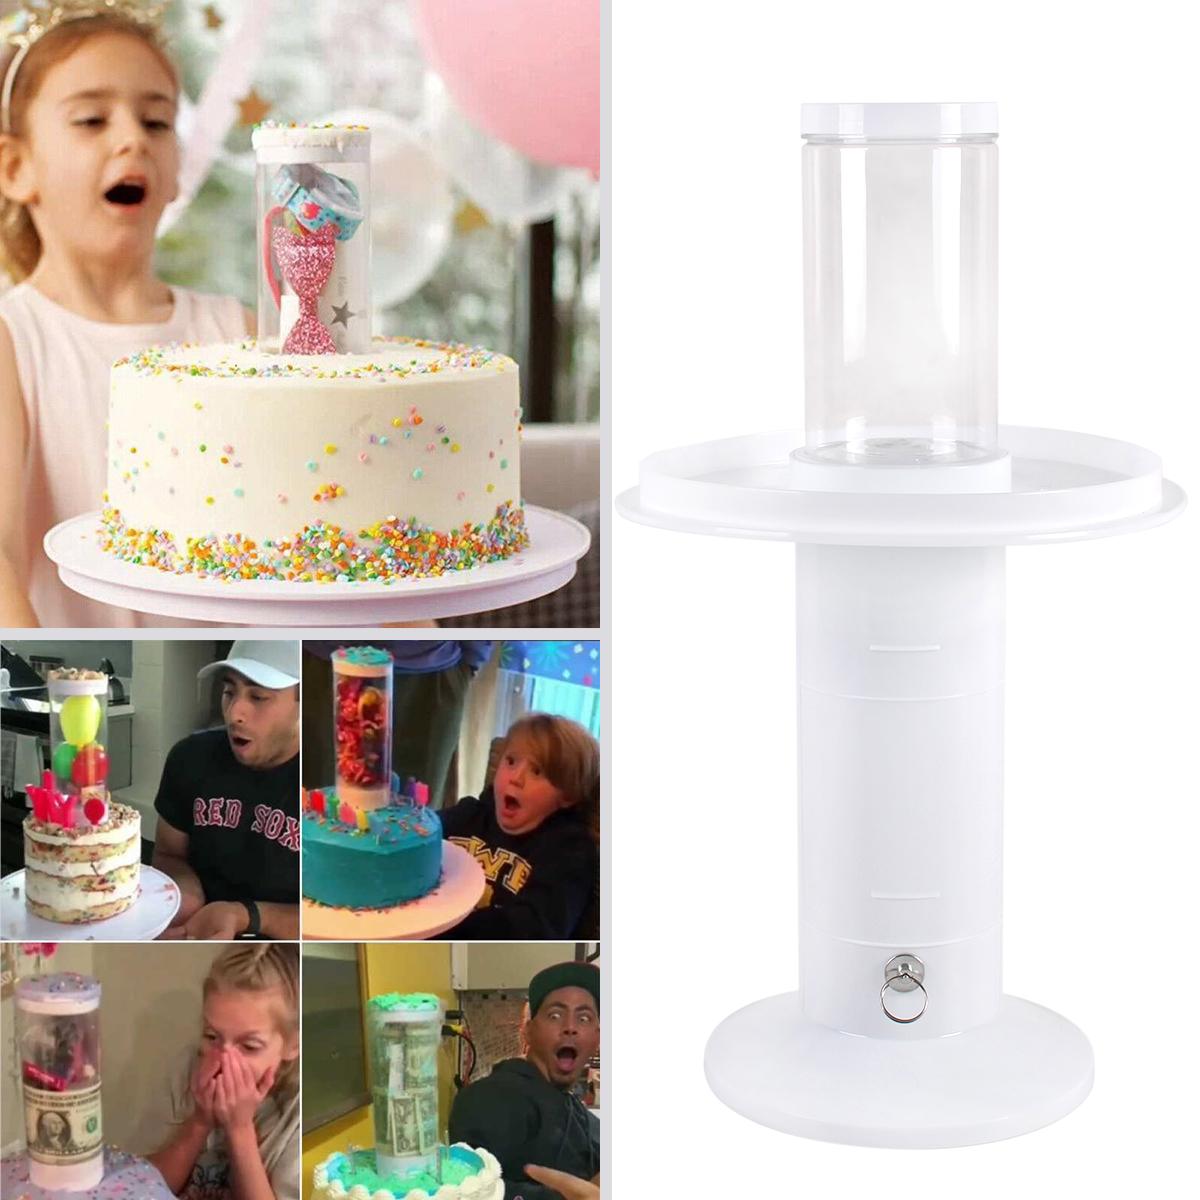 Outstanding 2In1 Surprise Popping Cake Stand Kids Birthday Cake Holder Wedding Funny Birthday Cards Online Amentibdeldamsfinfo